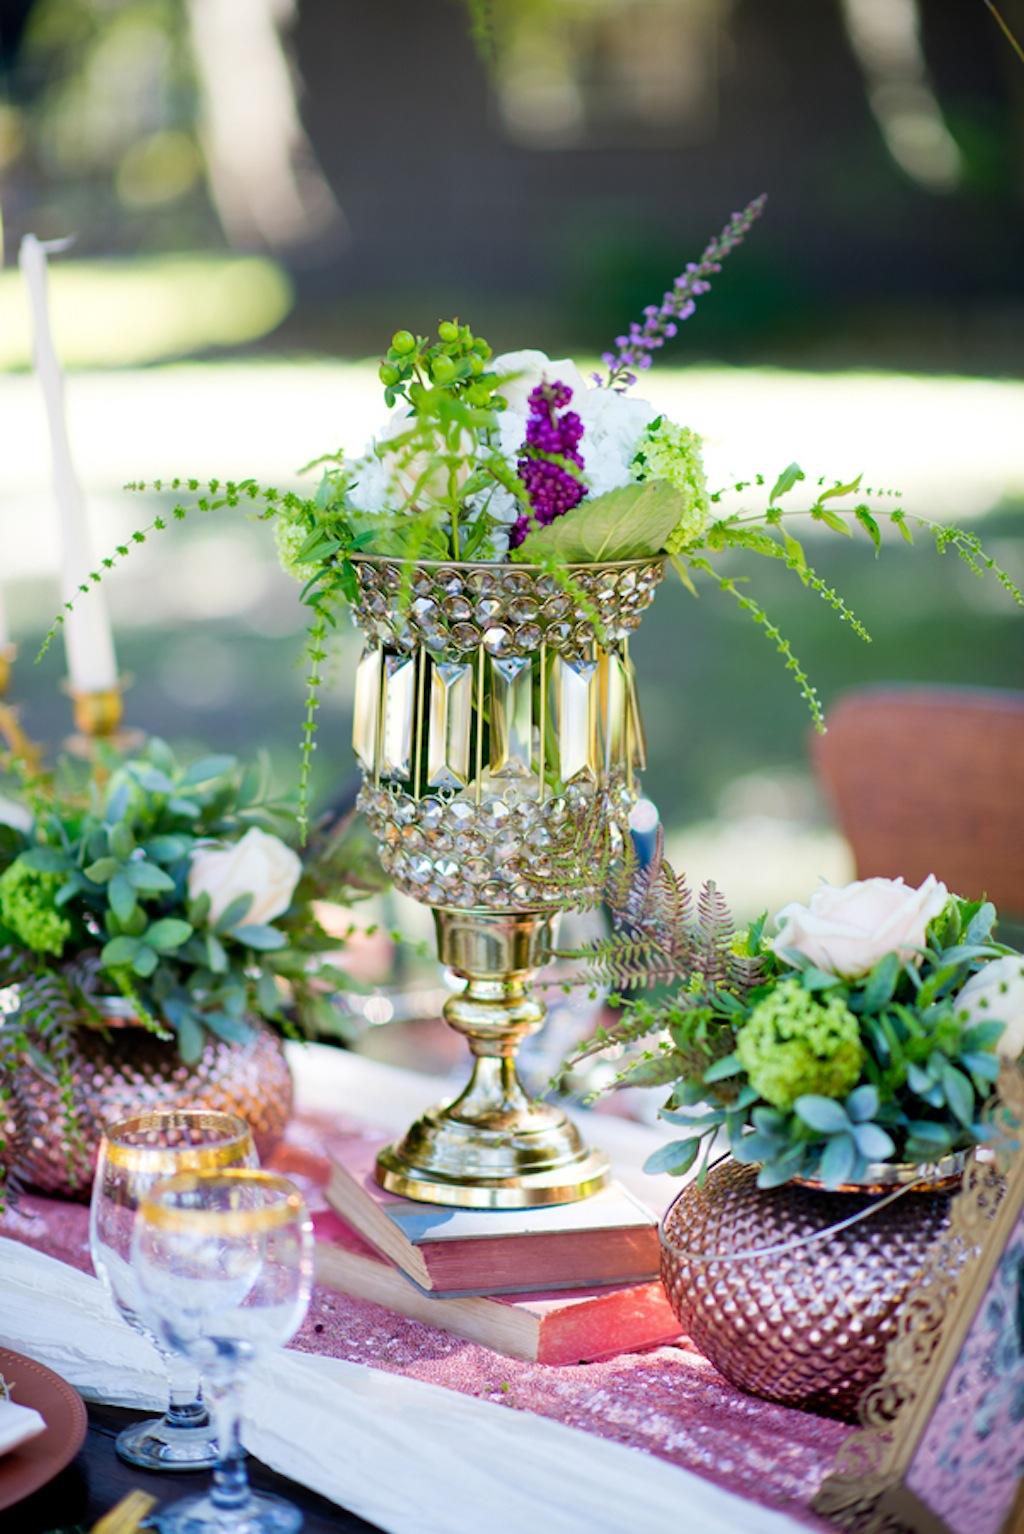 Rustic Green Wedding Centerpieces   Vintage, Garden Wedding Styled Shoot